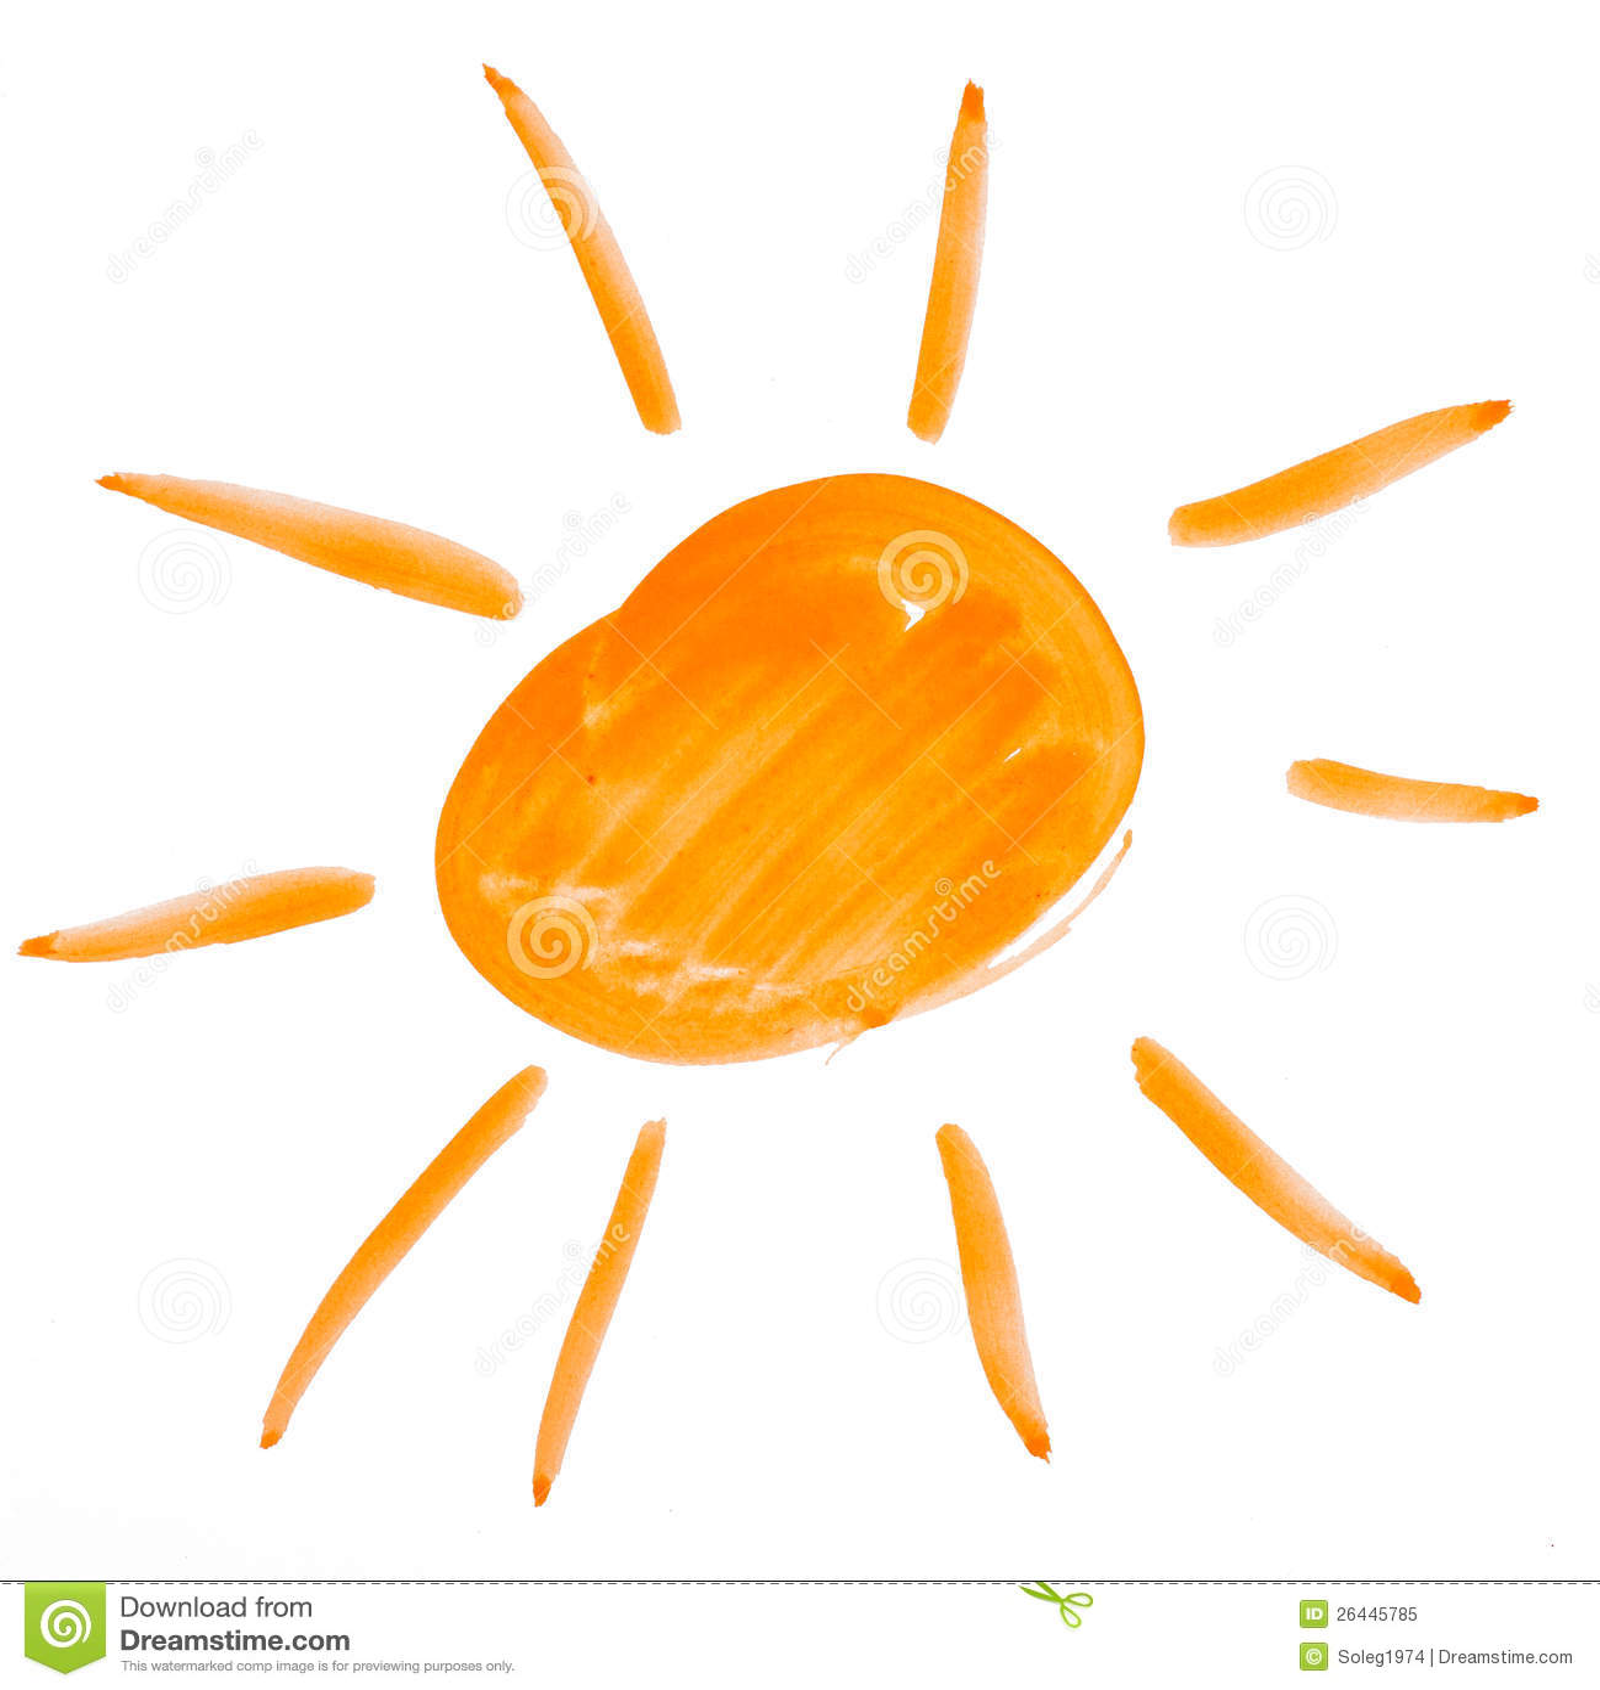 Uncategorized Drawing The Sun sun watercolor drawing paper 26445785 jpg